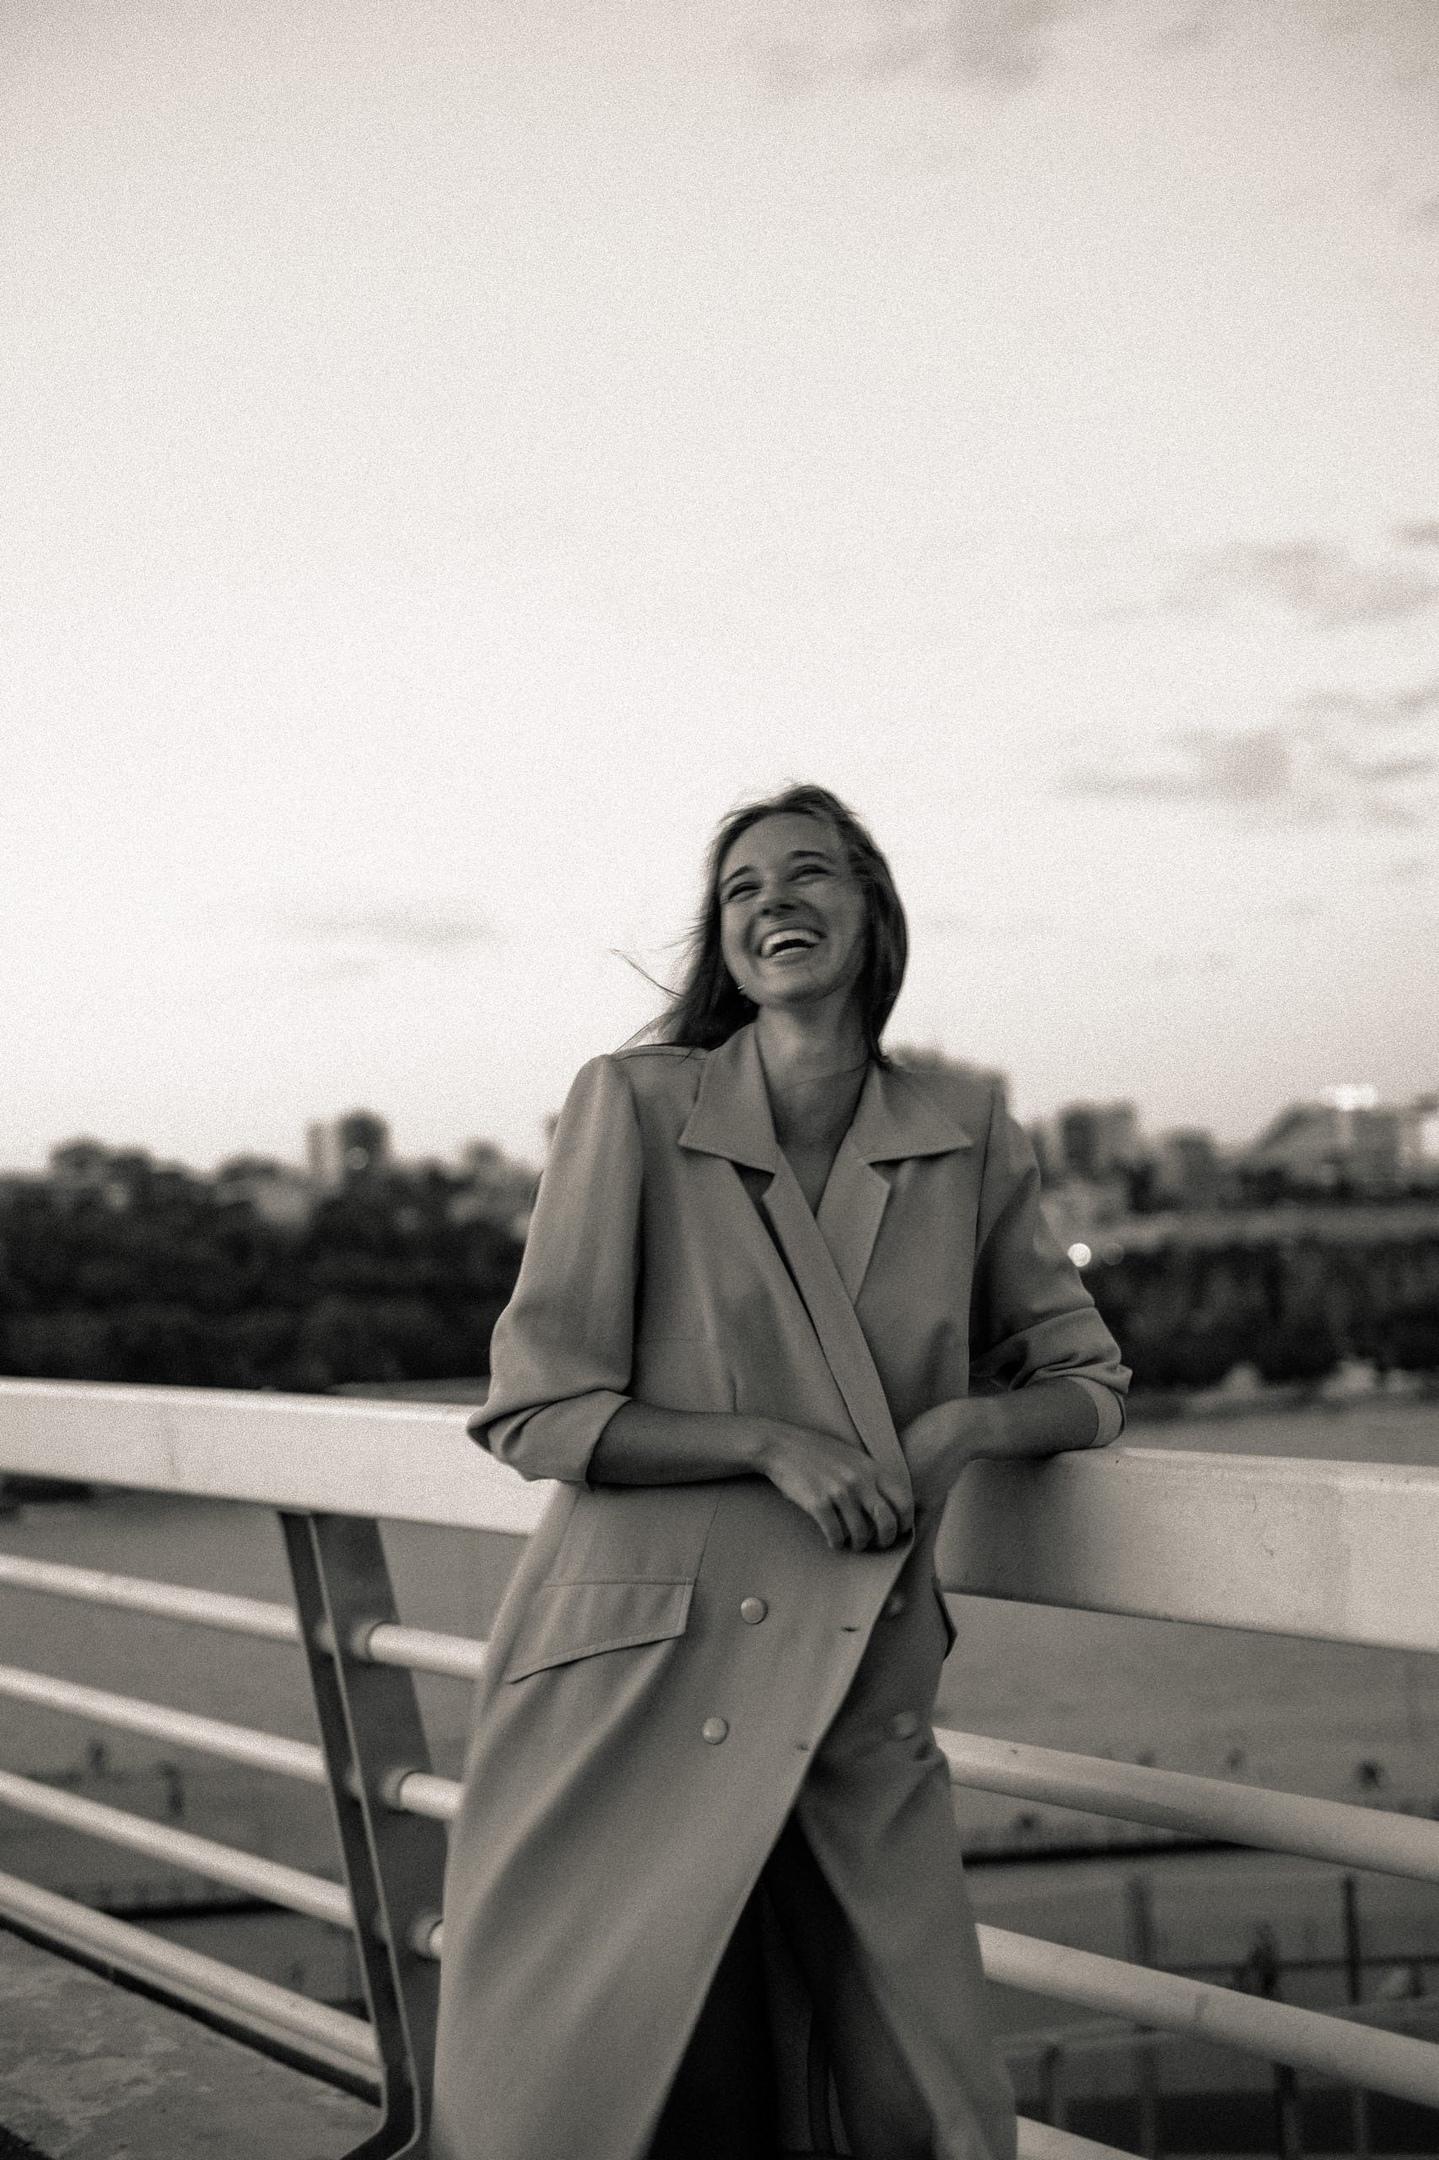 https://www.youngfolks.ru/pub/photographer-darina-bulgakova-114112